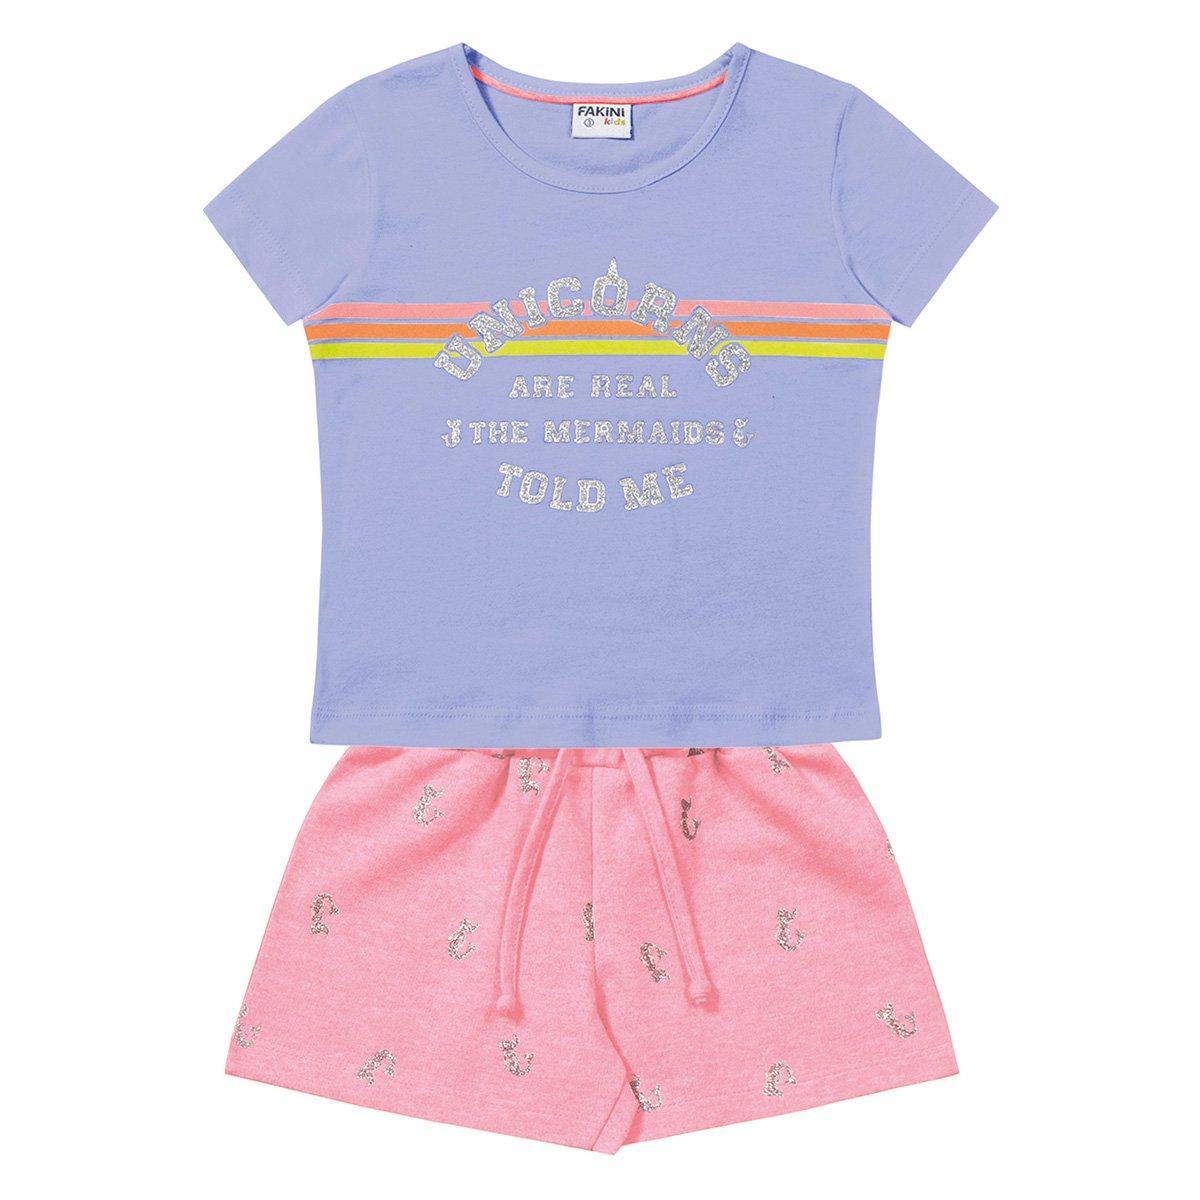 Conjunto Bebê Fakini Blusa Malha e Short Moletinho Unicorns Feminino